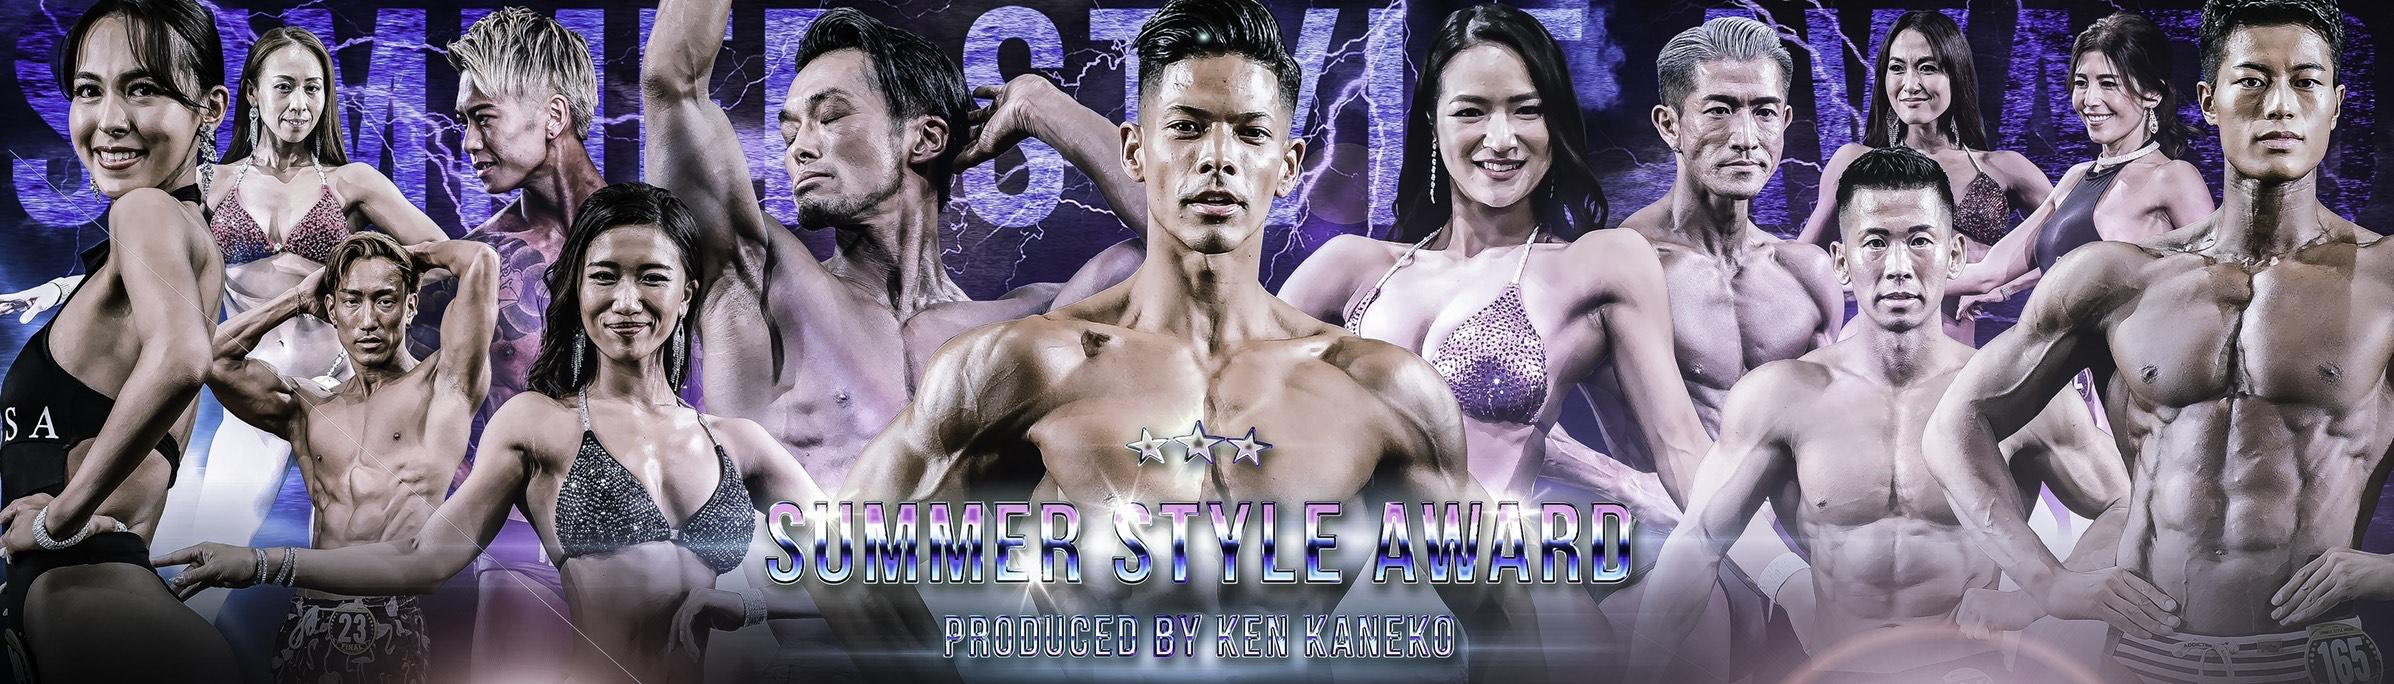 SUMMER STYLE AWARD Produced by KEN KANEKO